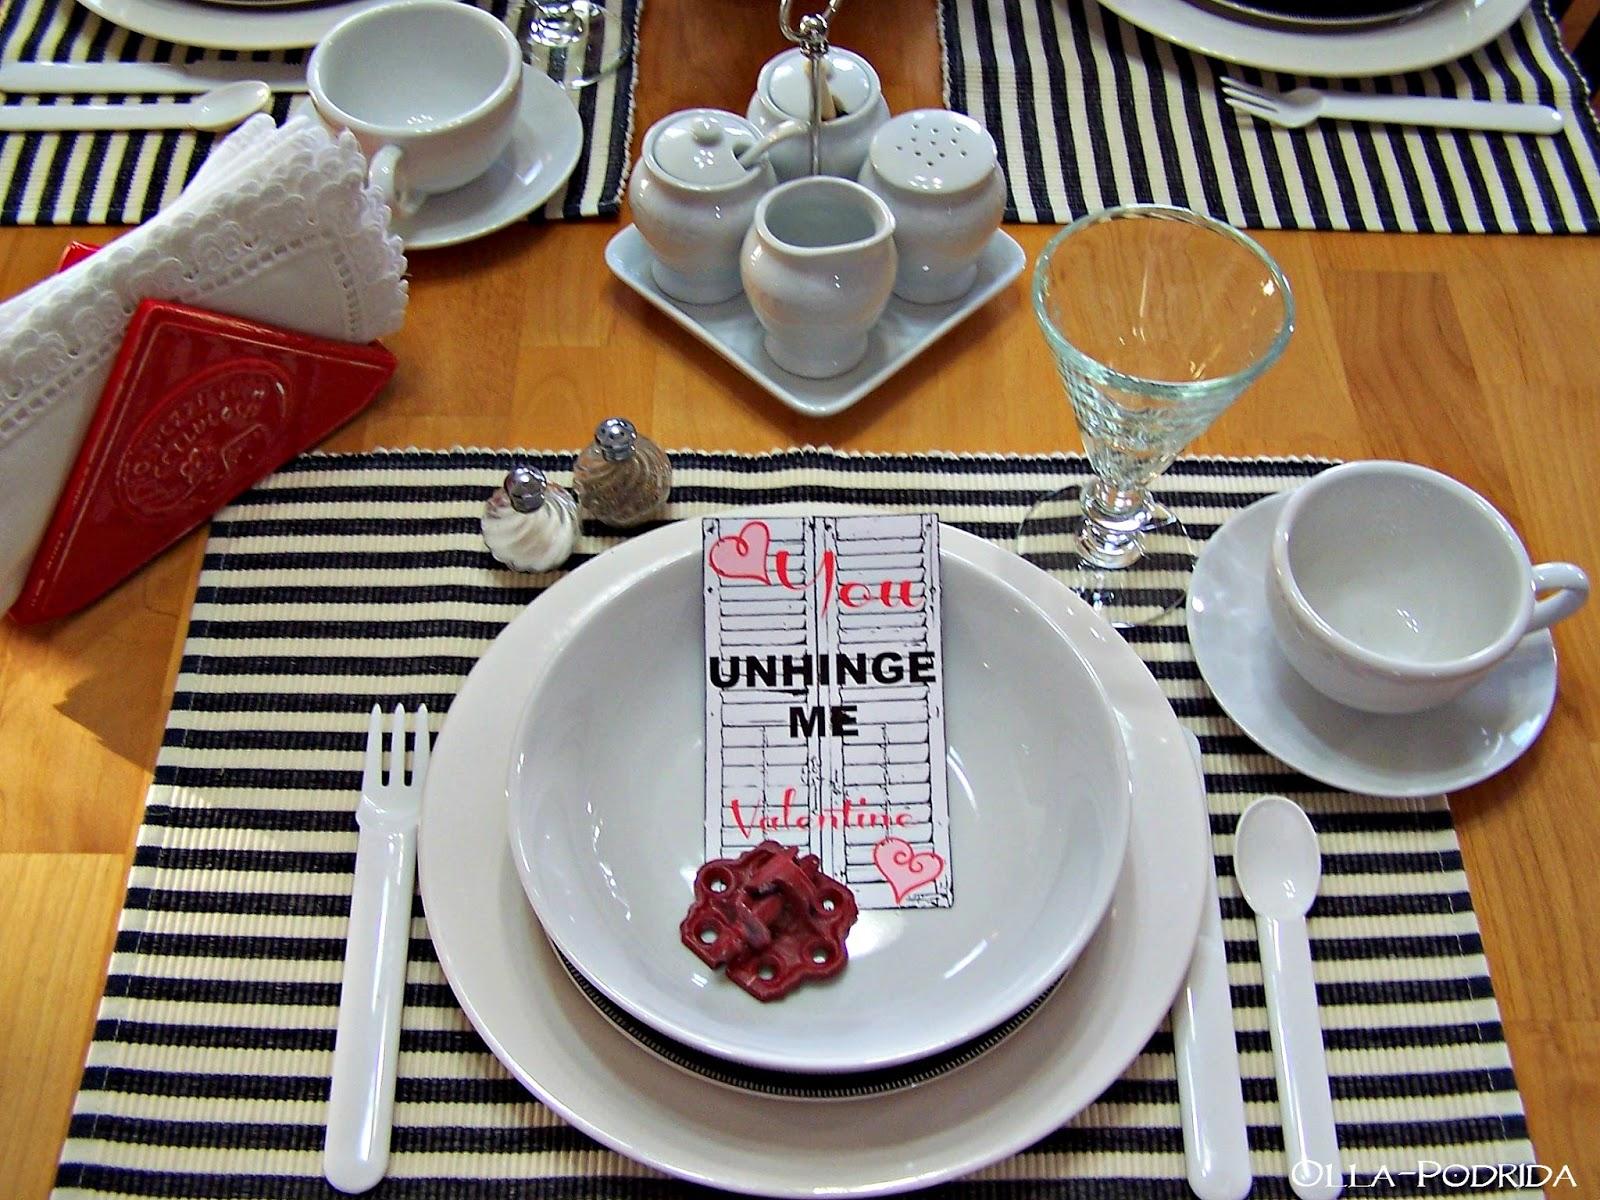 Olla-Podrida: Valentine Breakfast Tablesetting